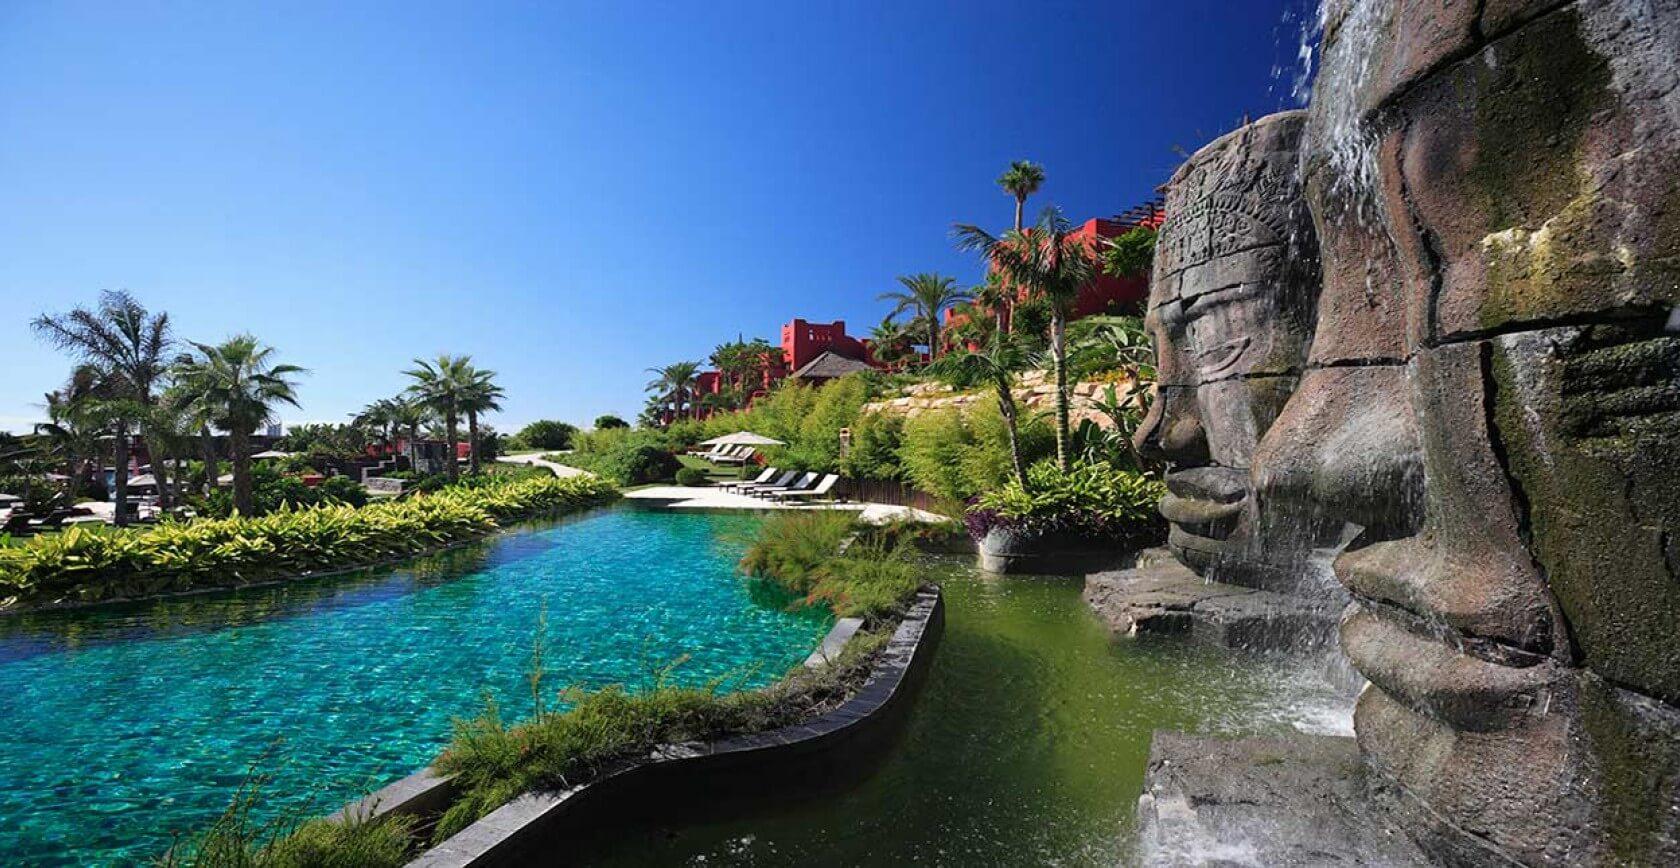 asia-gardens-waterfalls